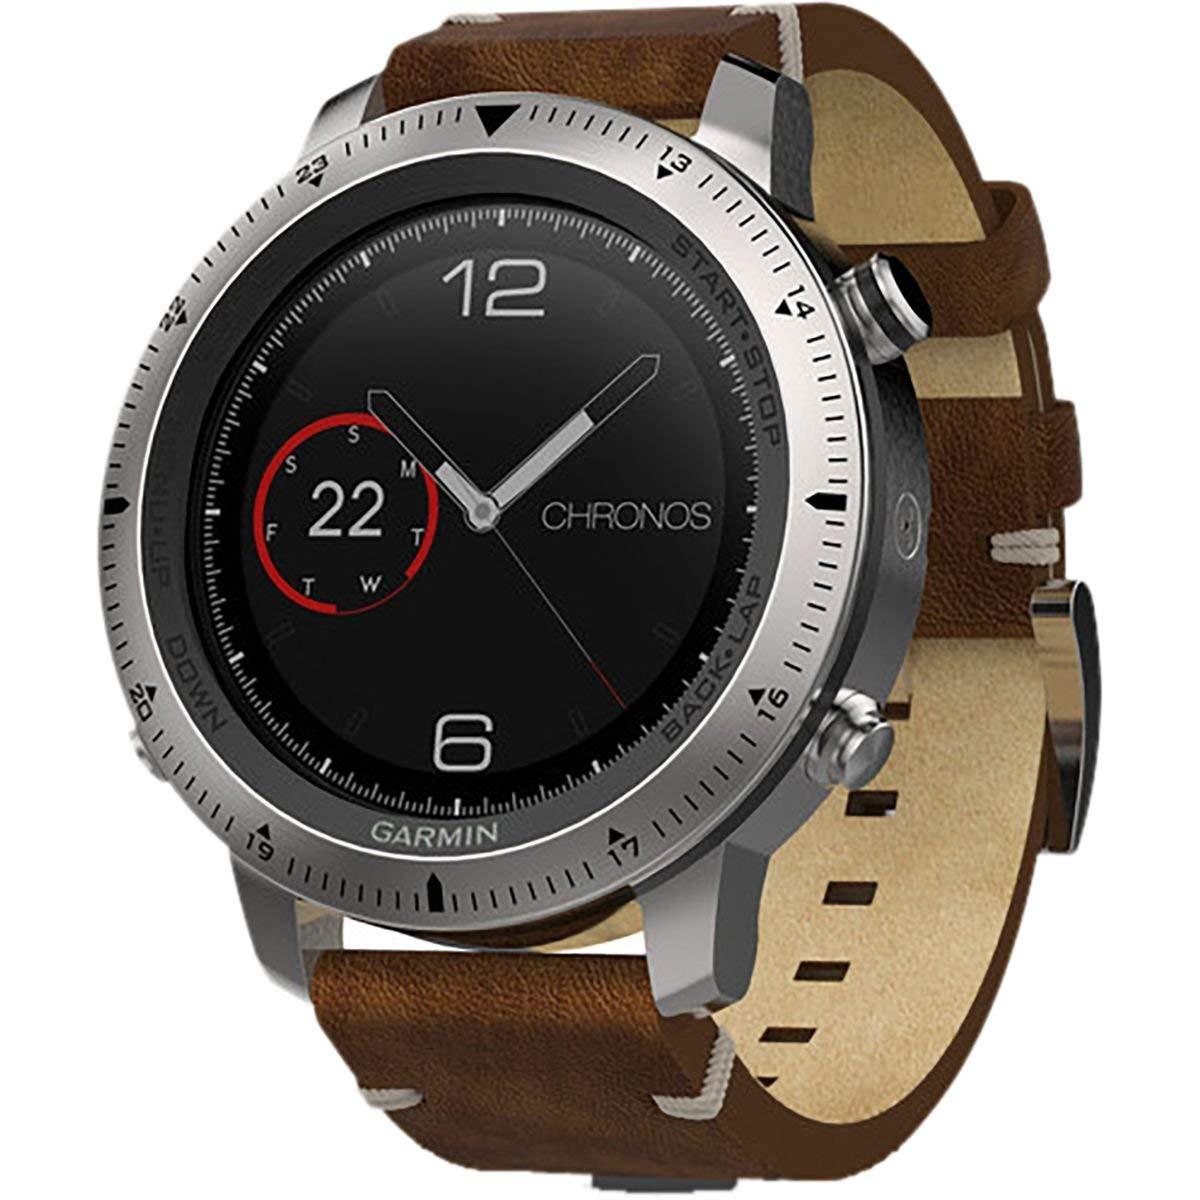 Garmin, Fenix Chronos, Watch, Steel with Brushed Stainless Steel Band, 010-01957-02 (Renewed)